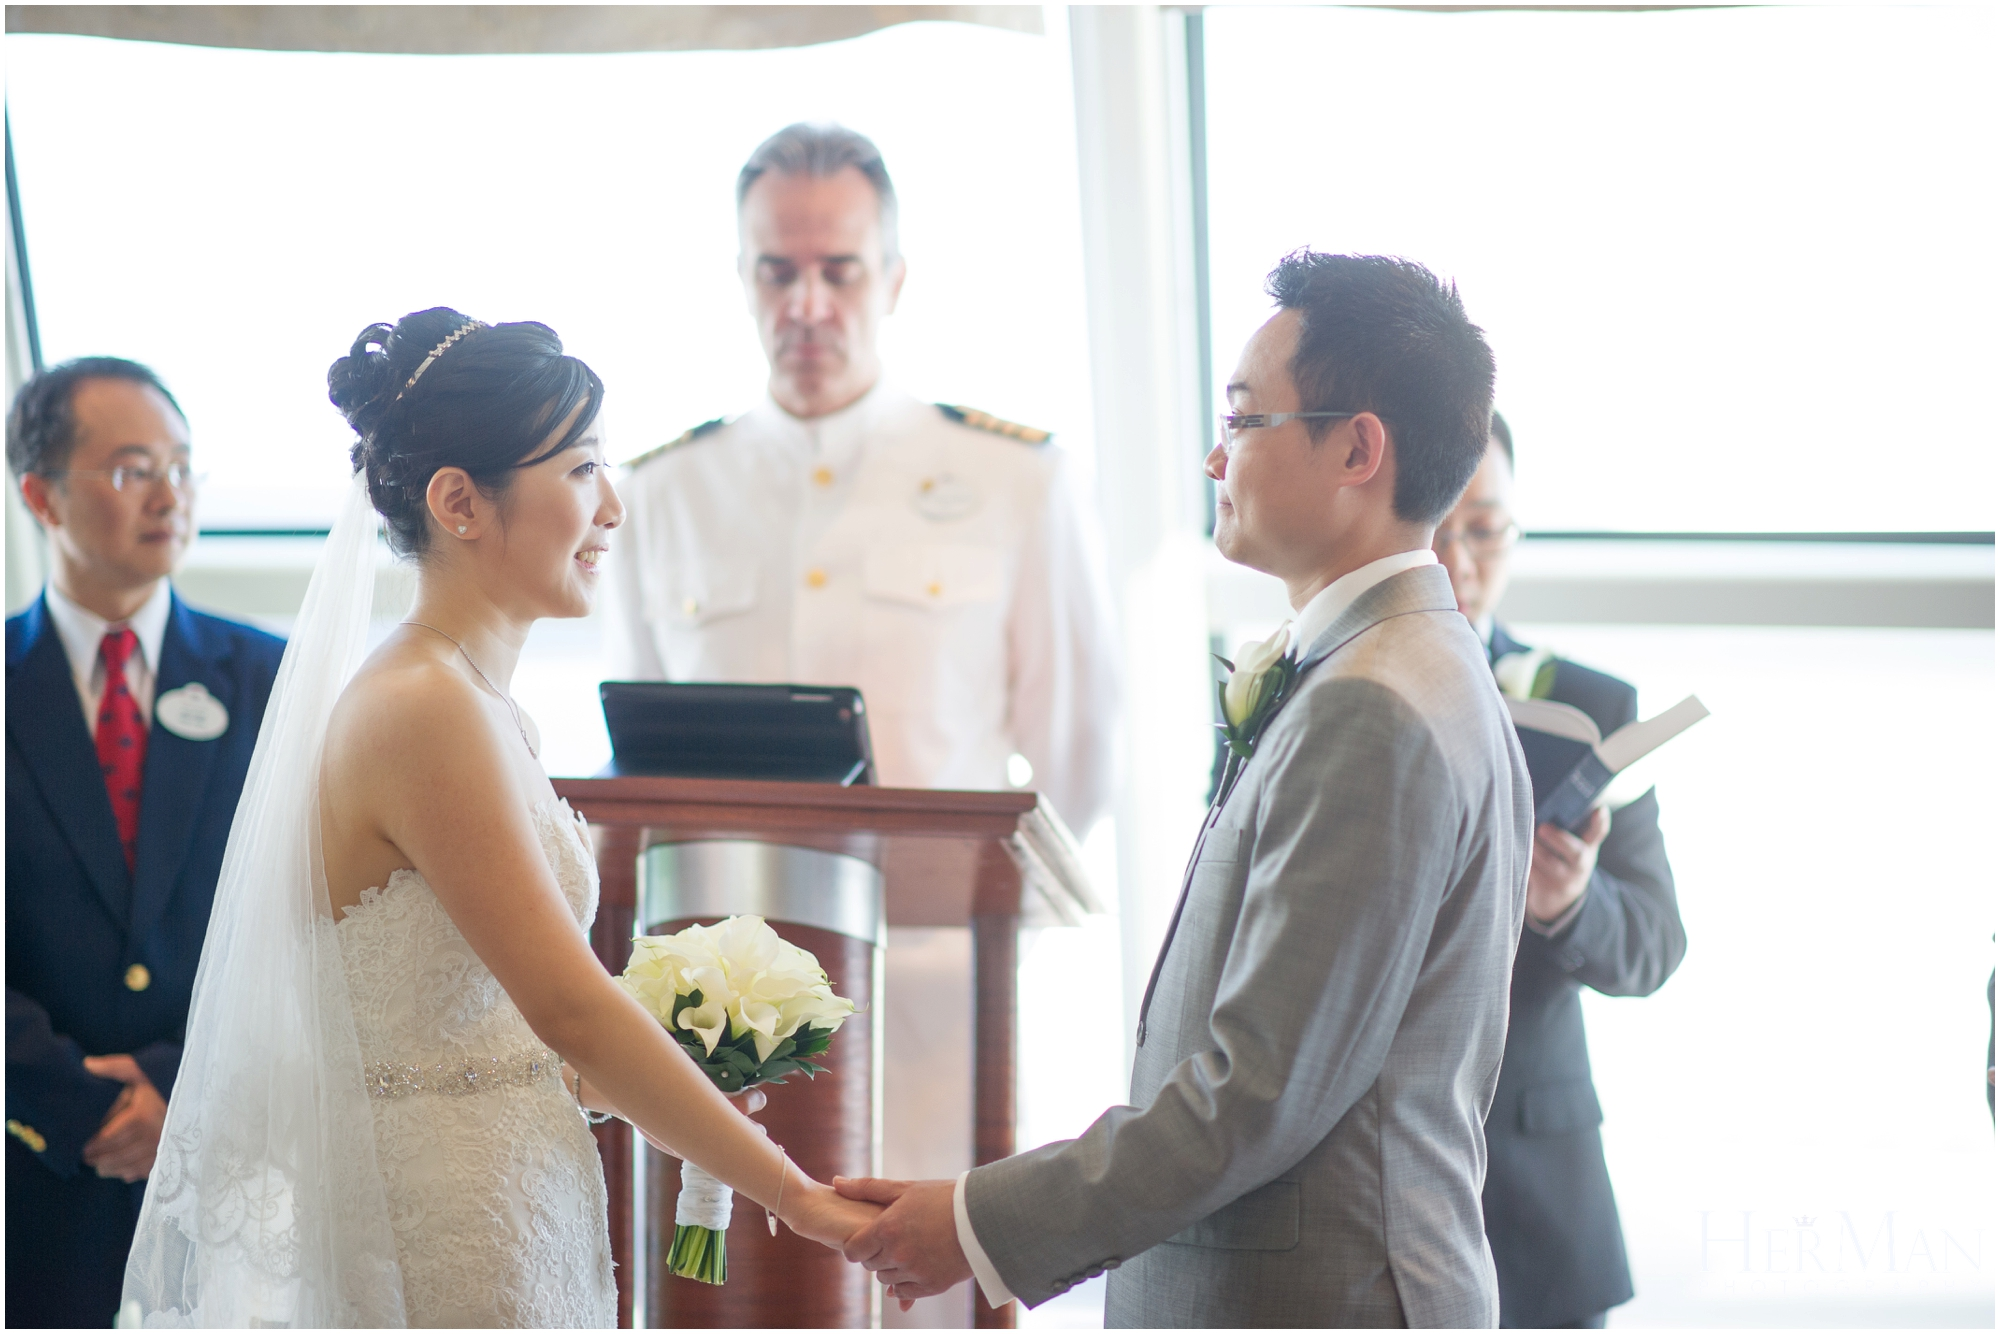 disney-fantasy-cruise-wedding-HerMan-photography_0028.jpg